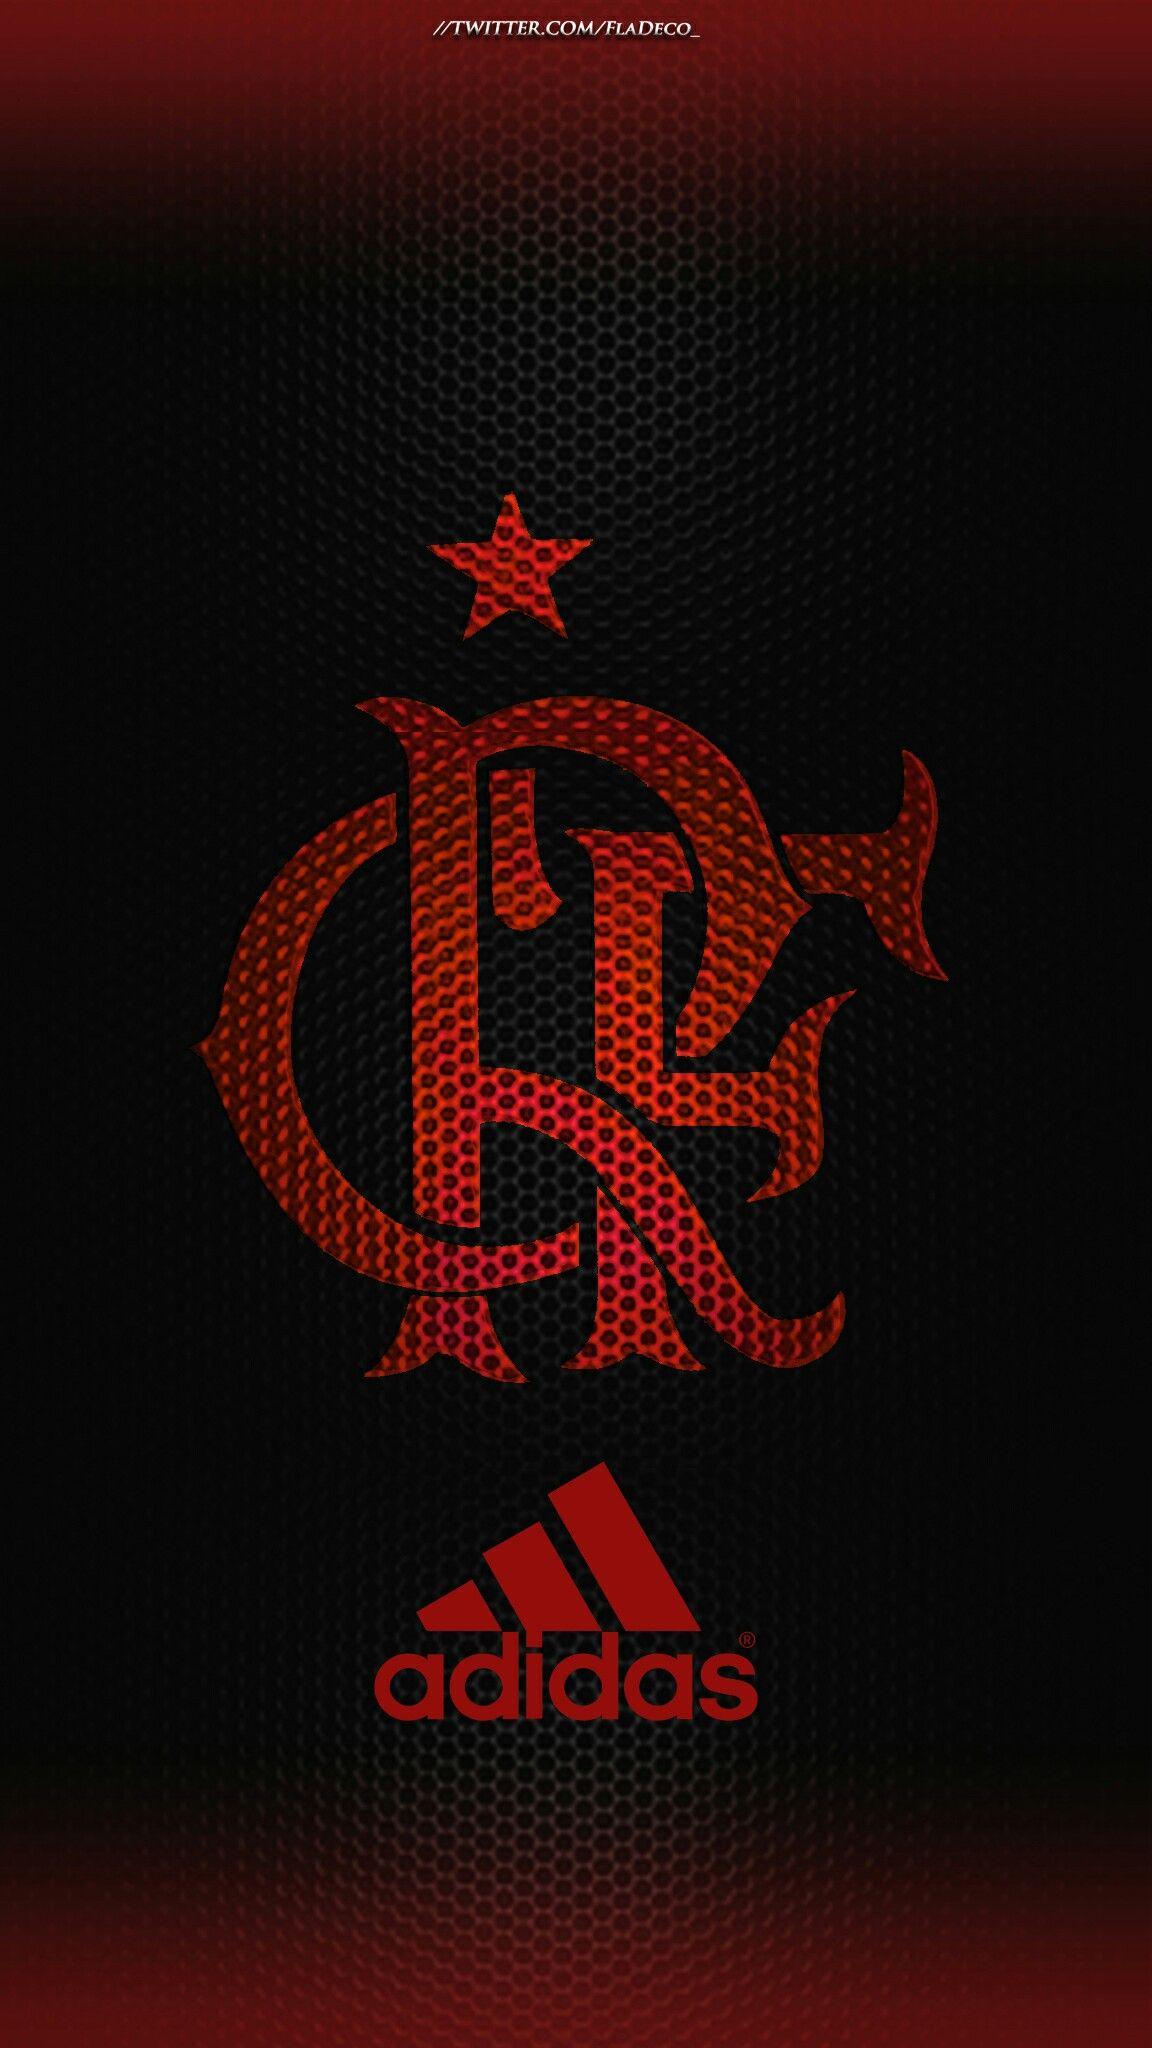 #Flamengo - Adidas wallpaper | soccer | Flamengo, Flamengo papel de parede, Flamengo futebol clube